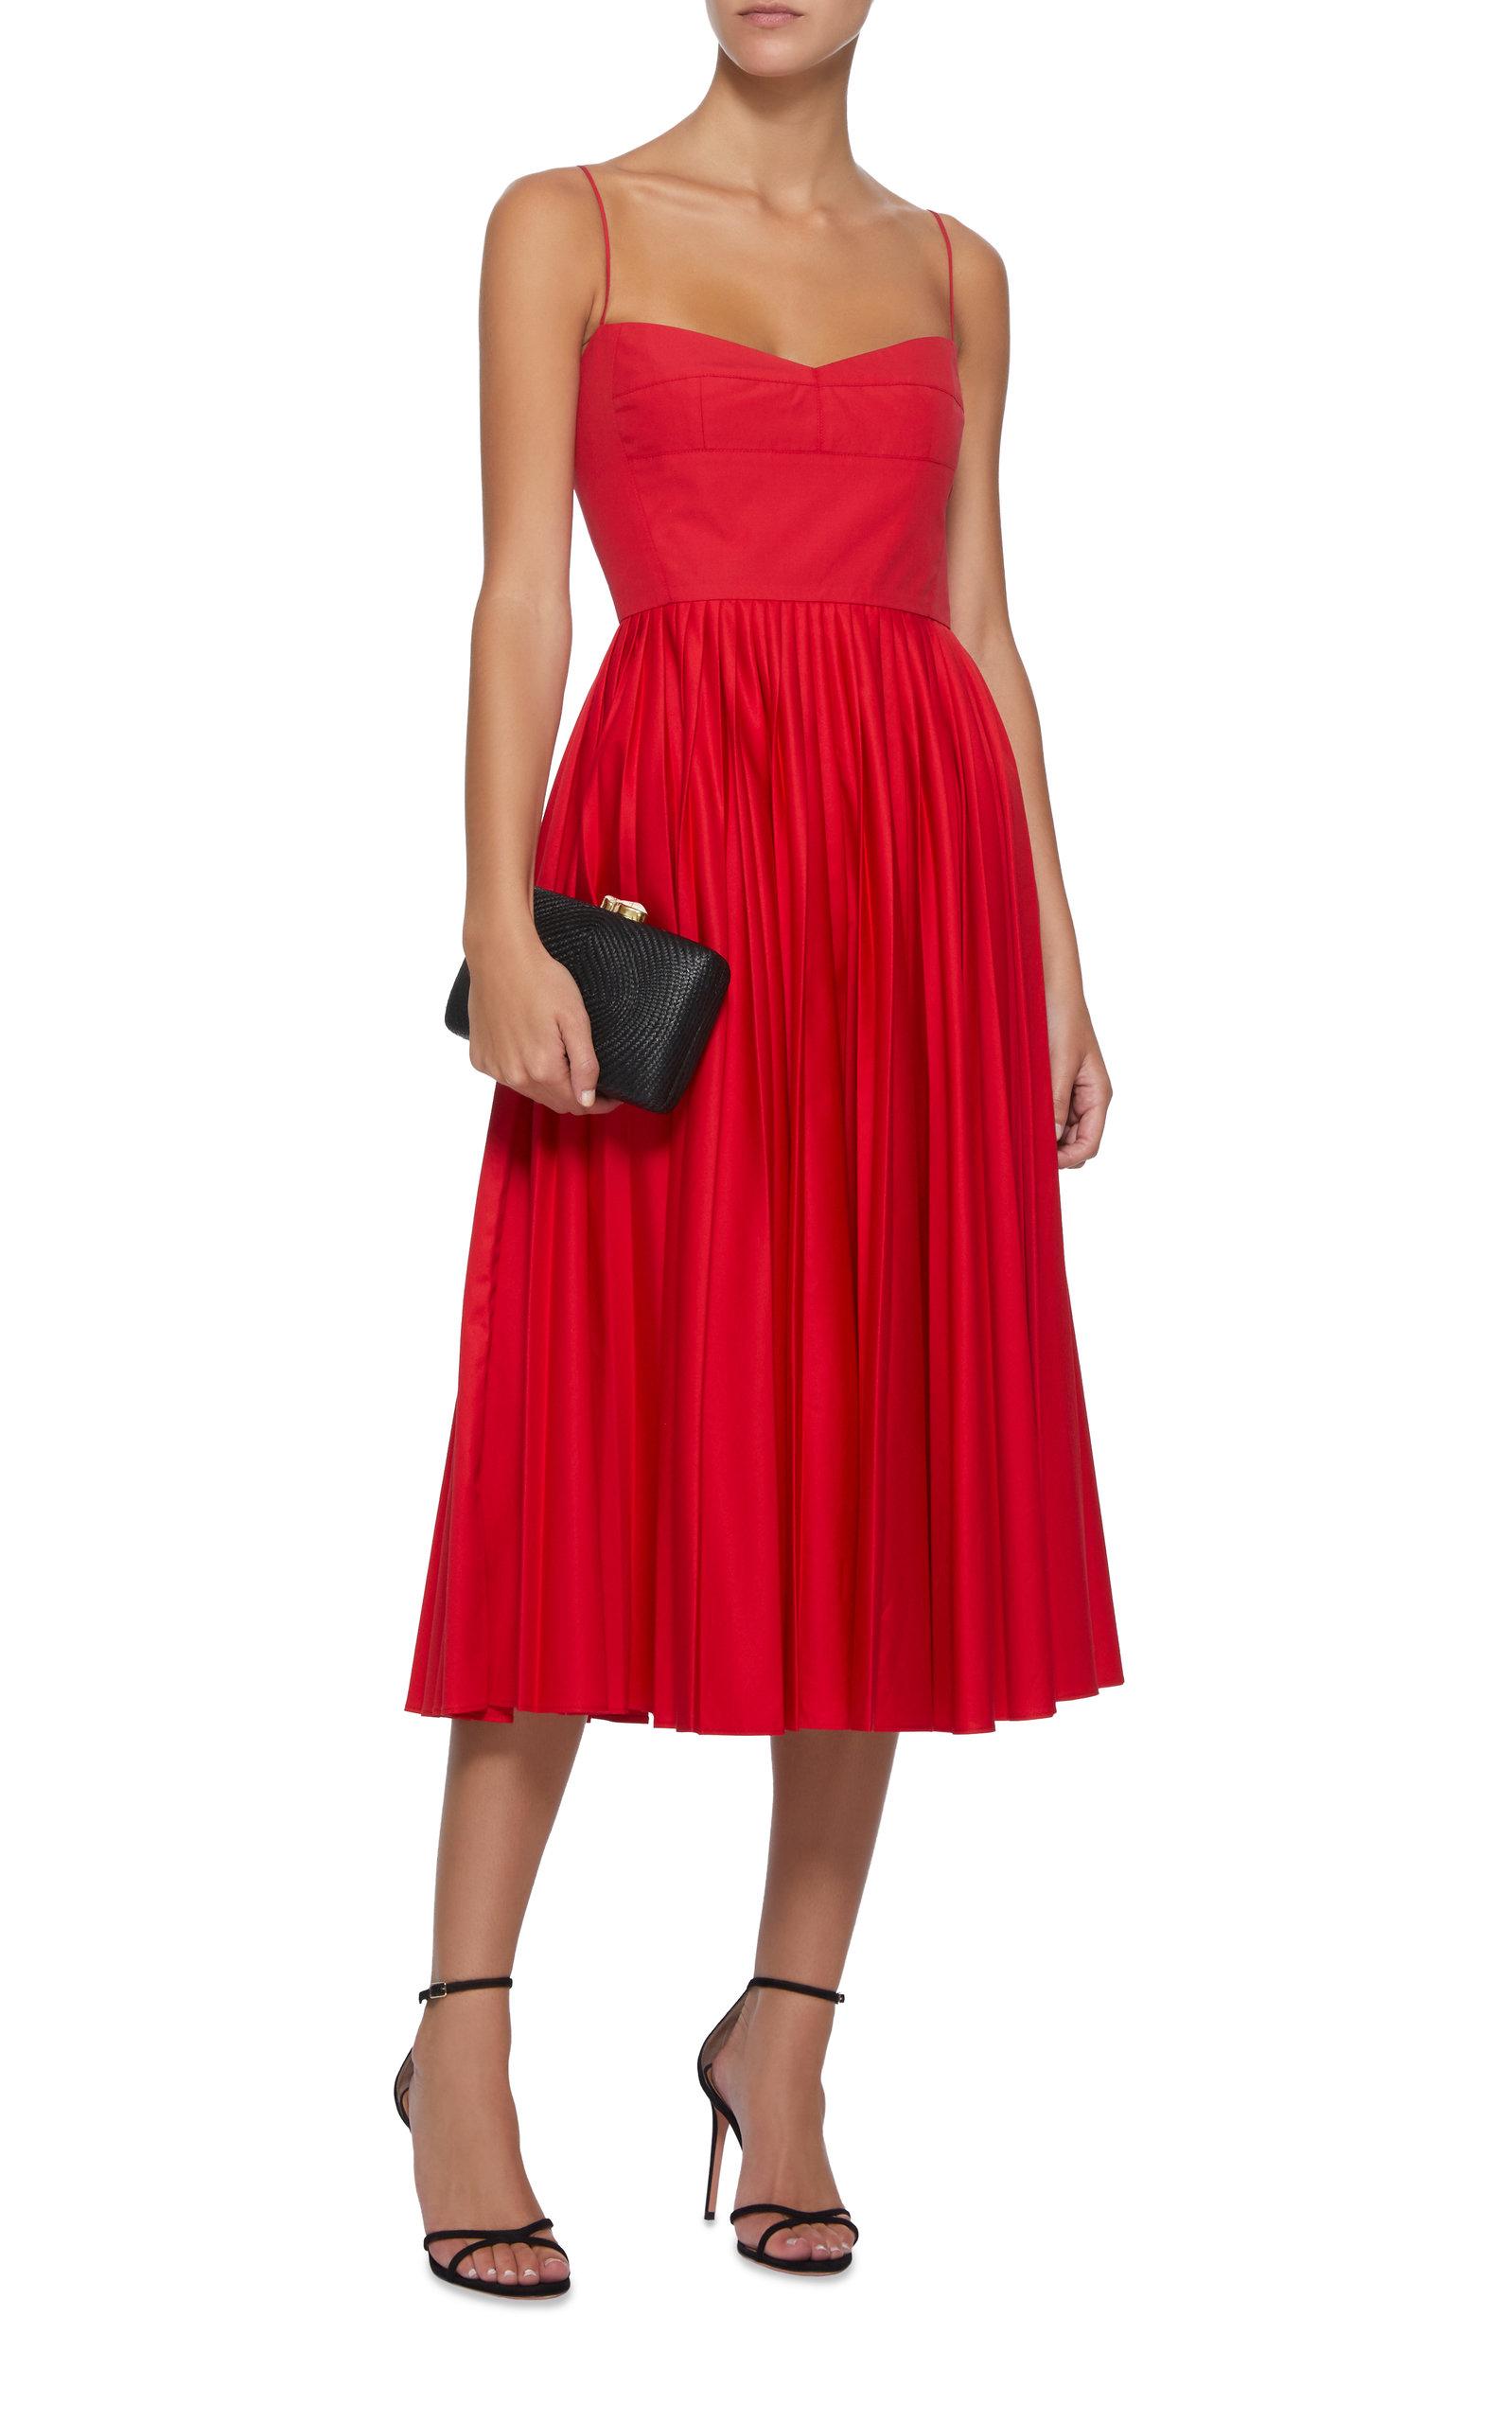 red Pleated Cotton Midi Dress